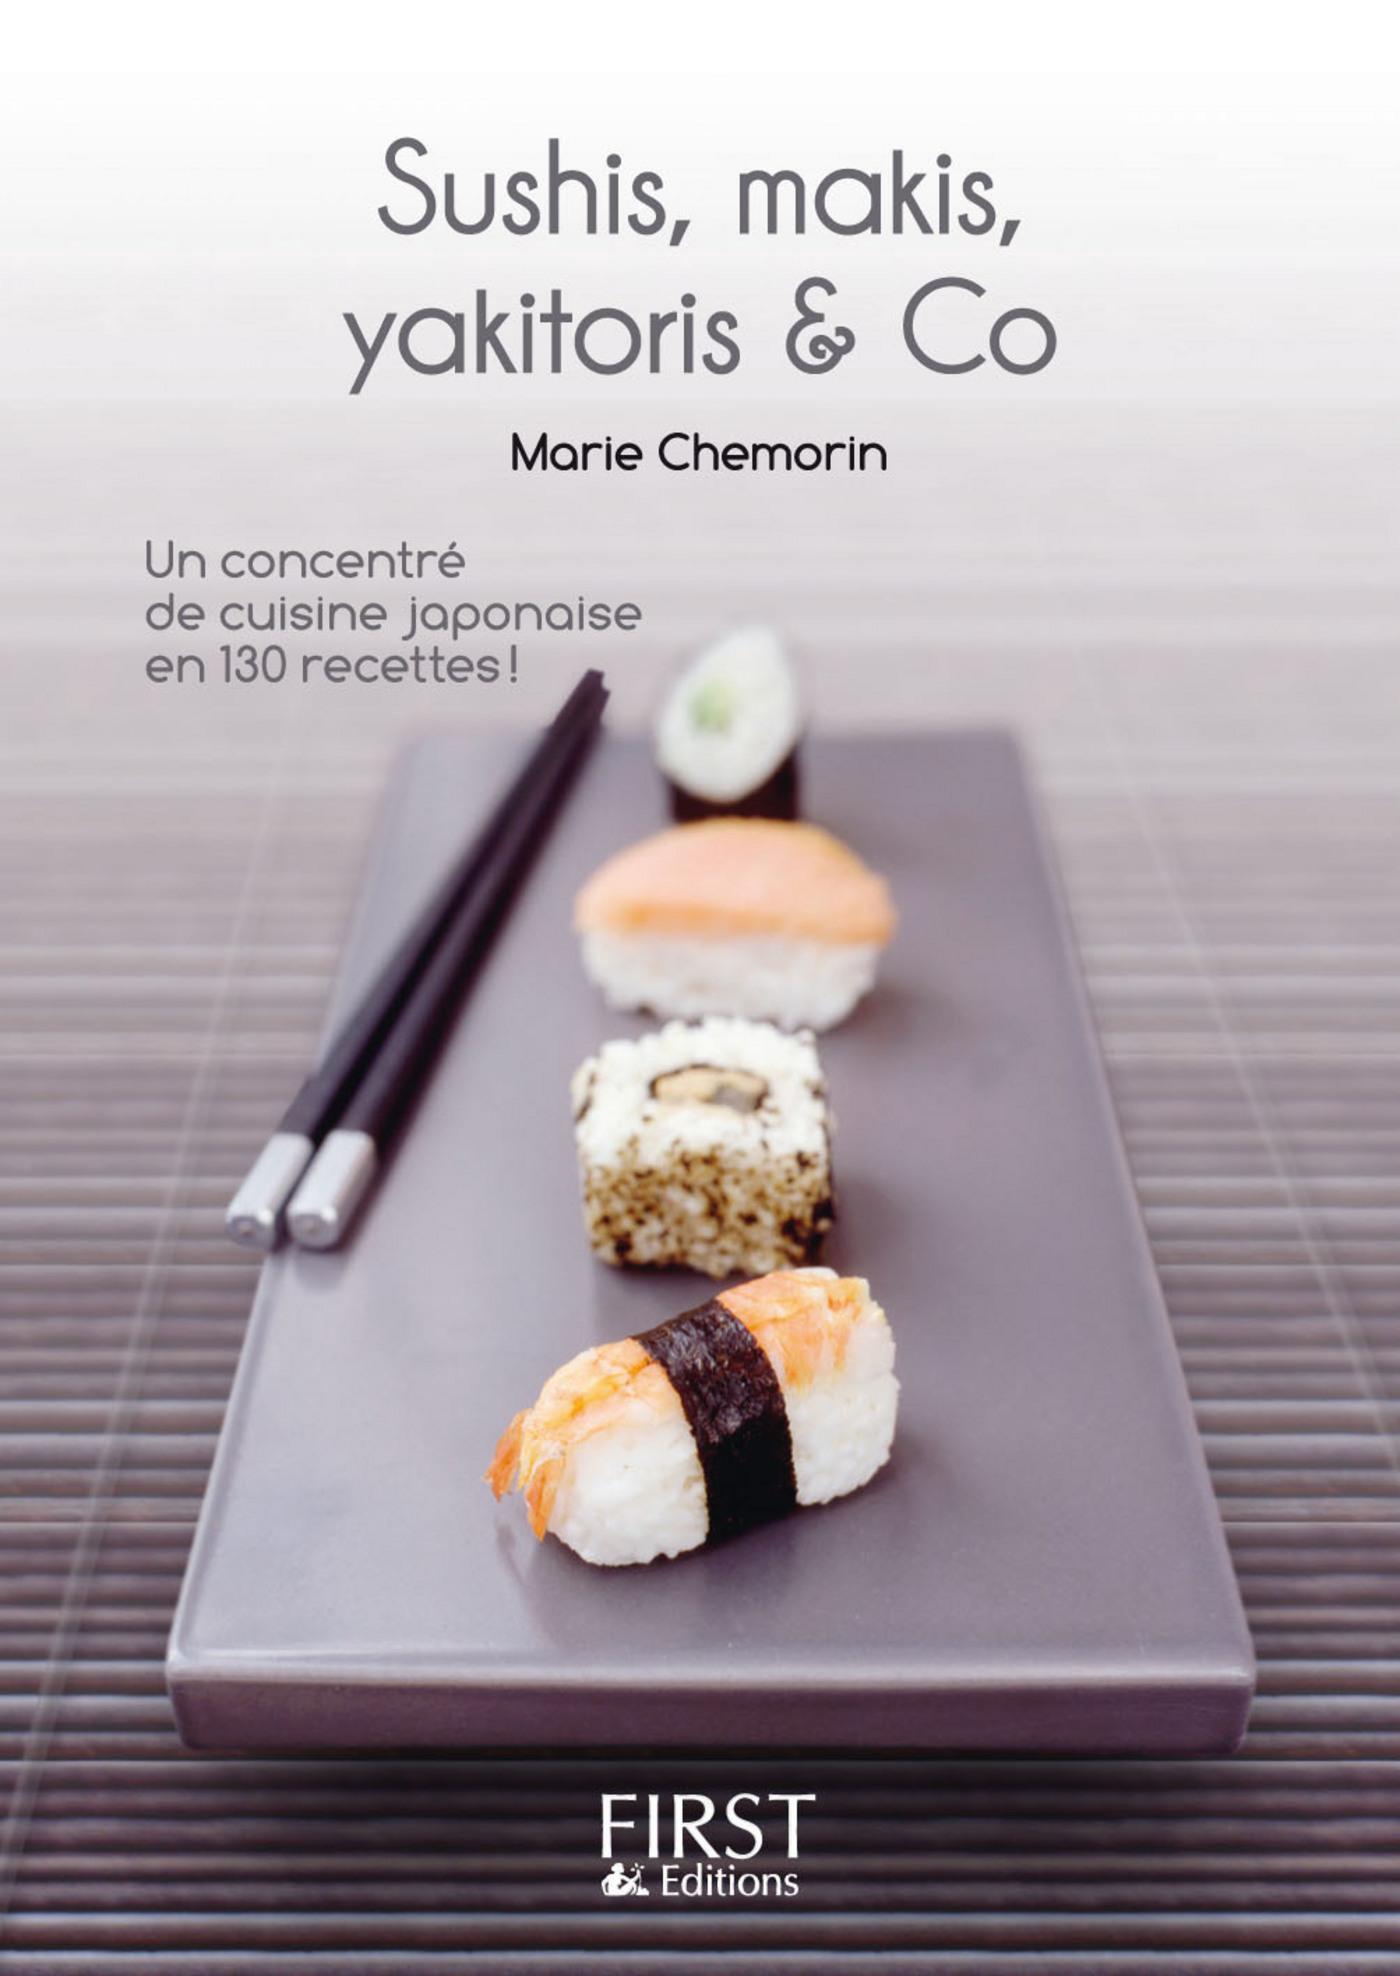 Le Petit Livre de - Sushi, maki, yakitori, bento and Co (ebook)